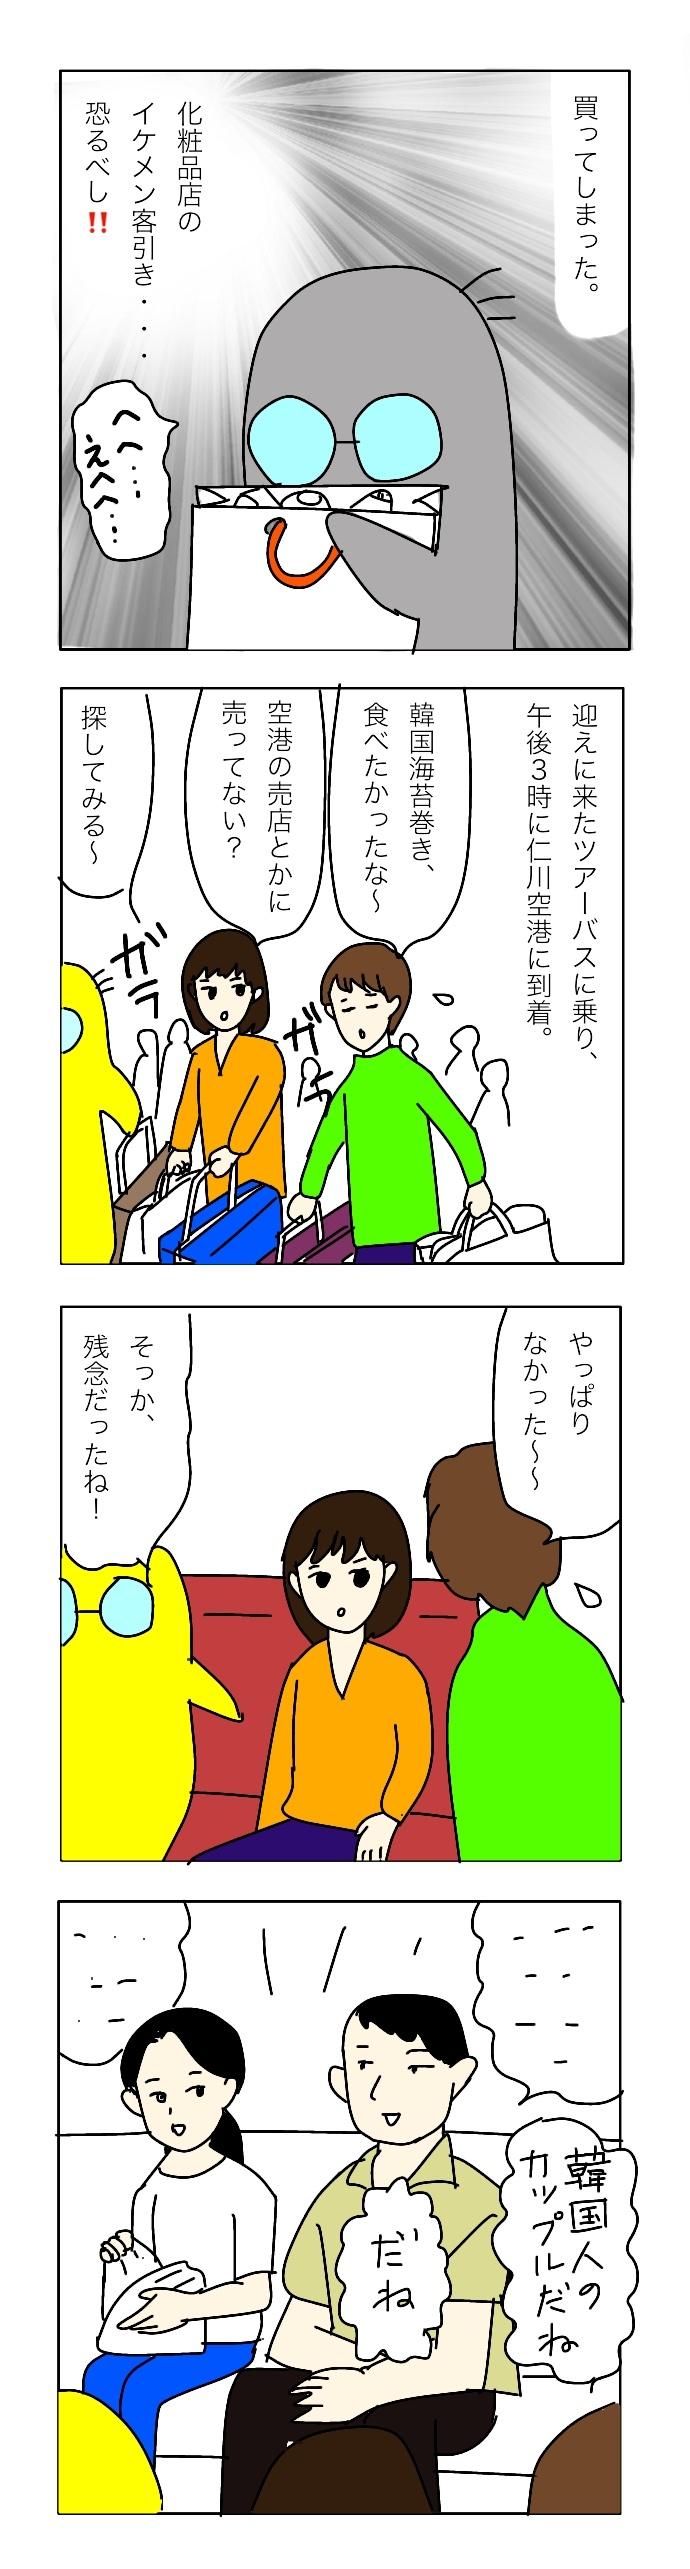 kankoku7 のりまき